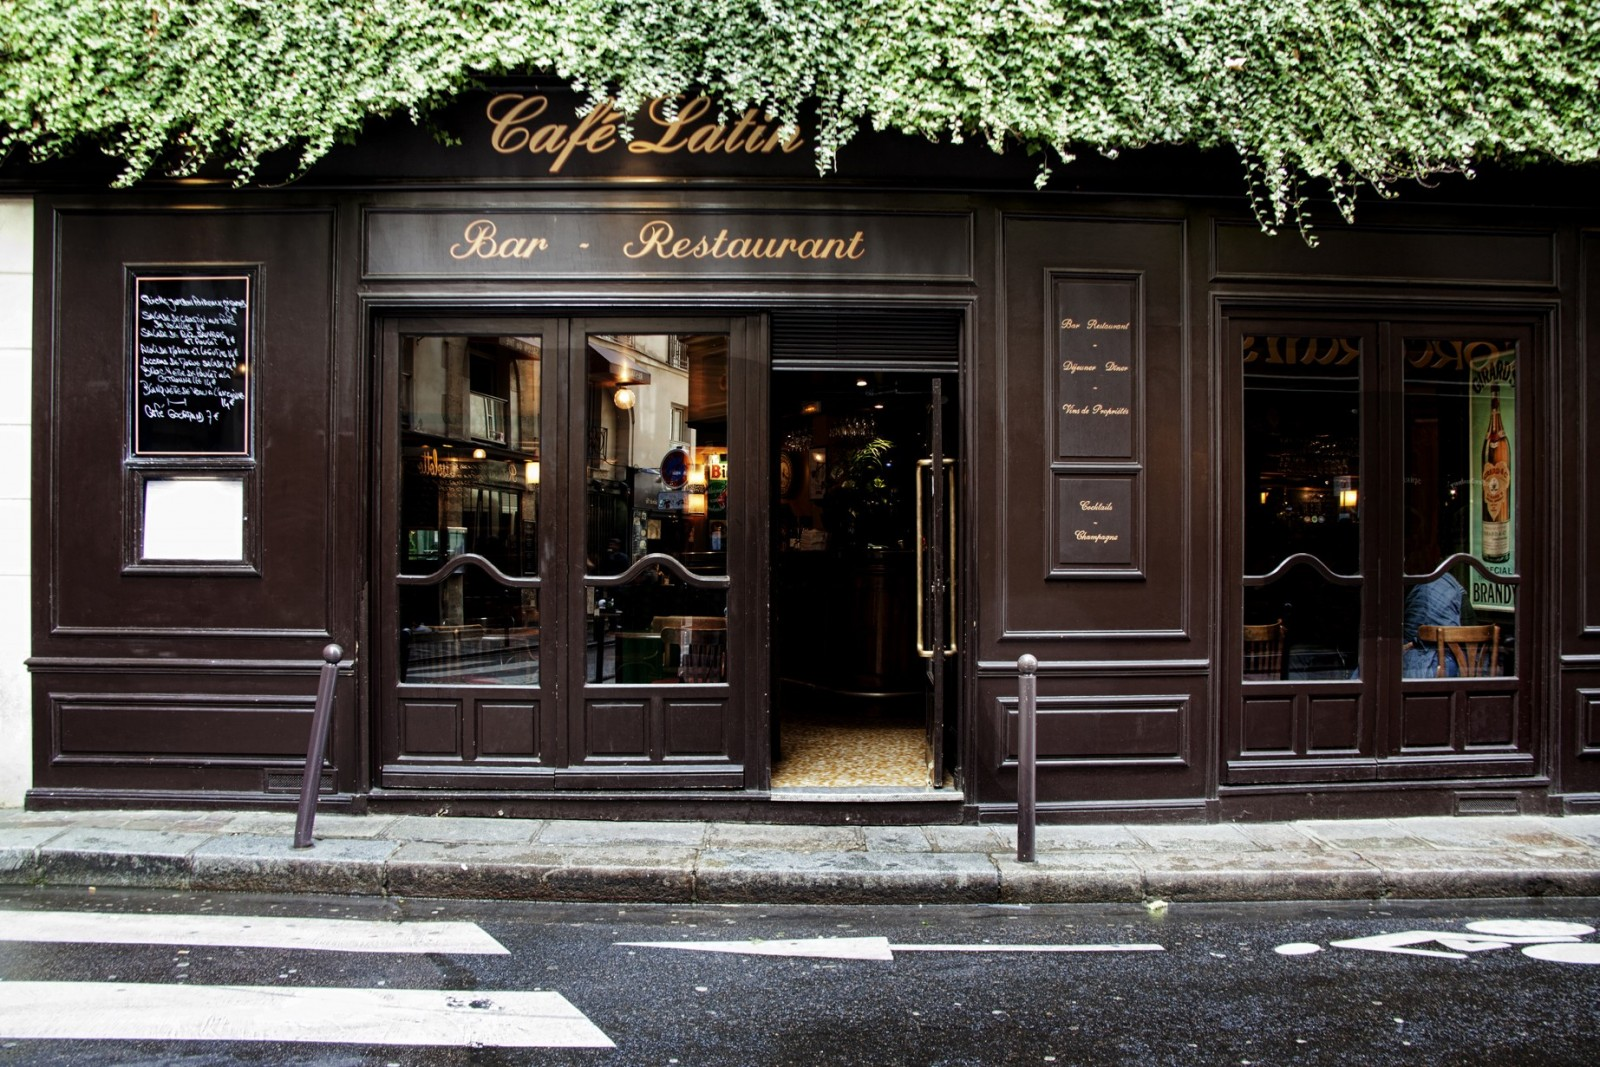 Café Latin Bar Restaurant Latin Quarter Paris  OFFICIAL